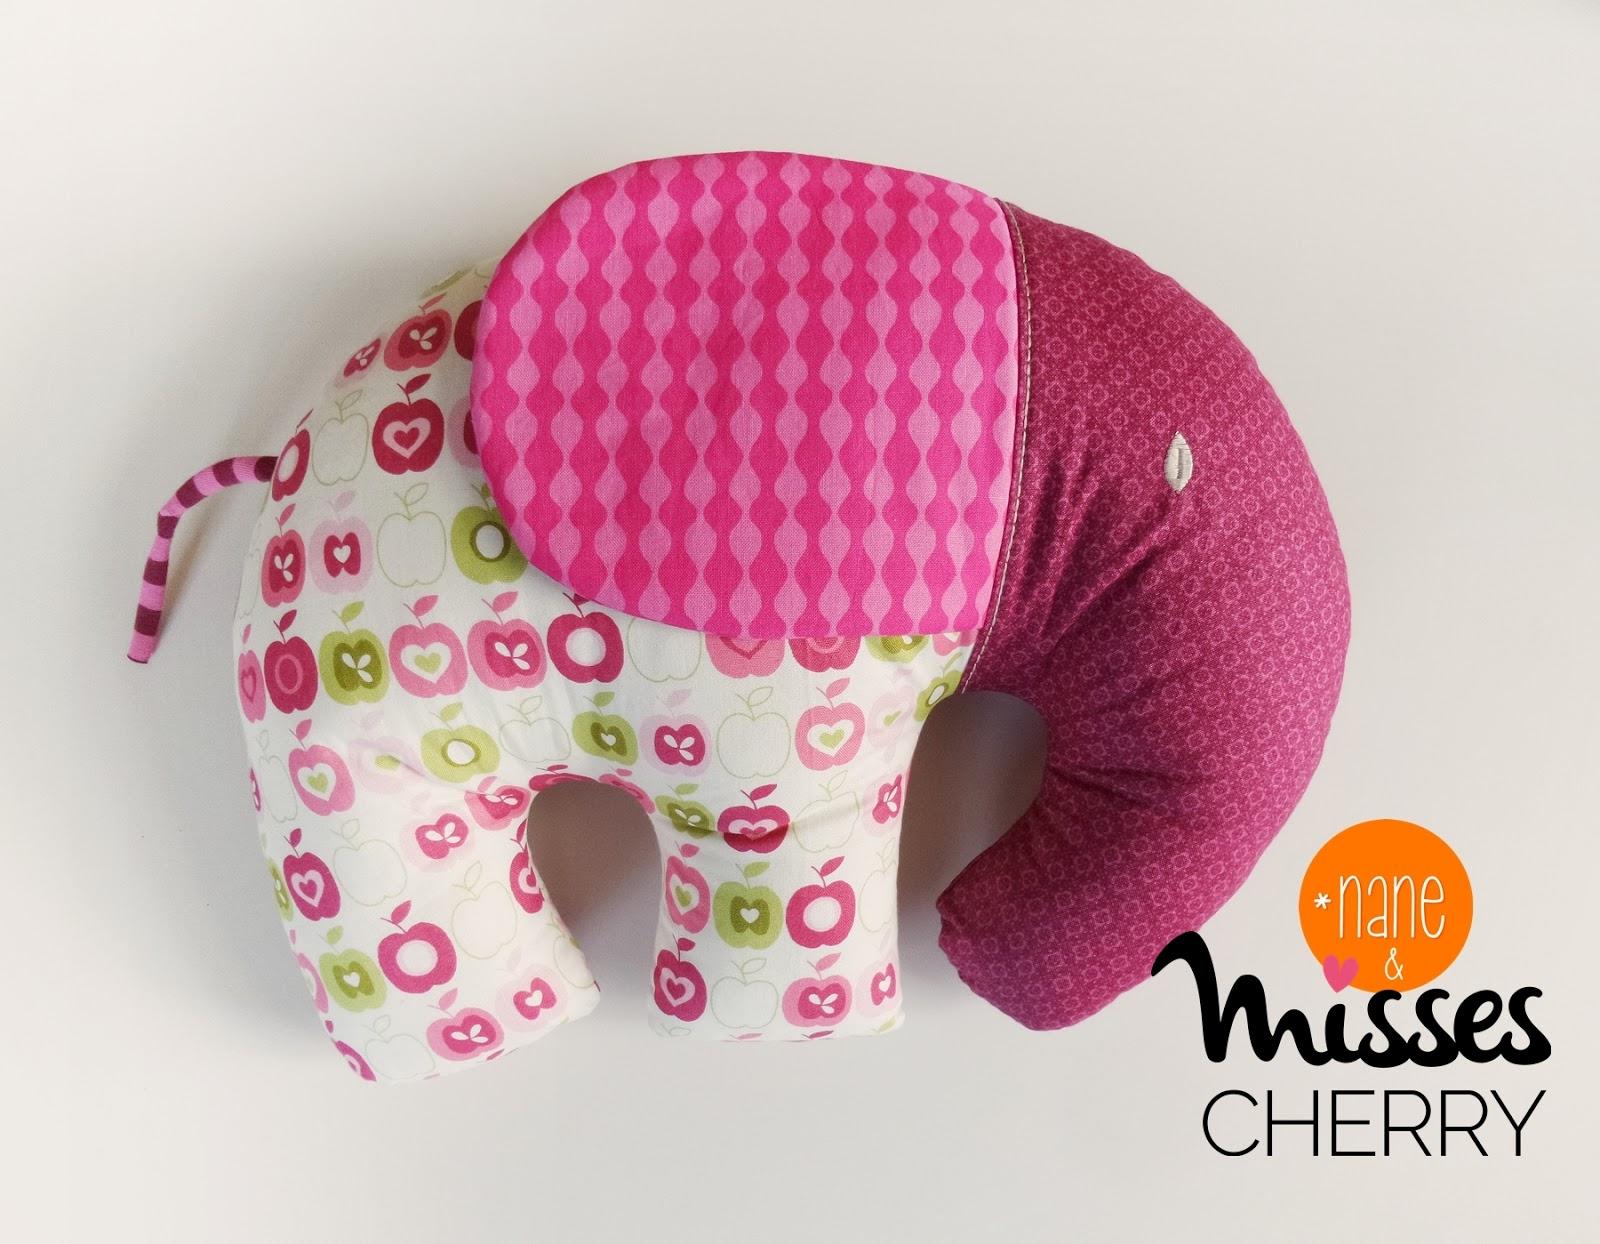 Misses Cherry: Elefantenkissen